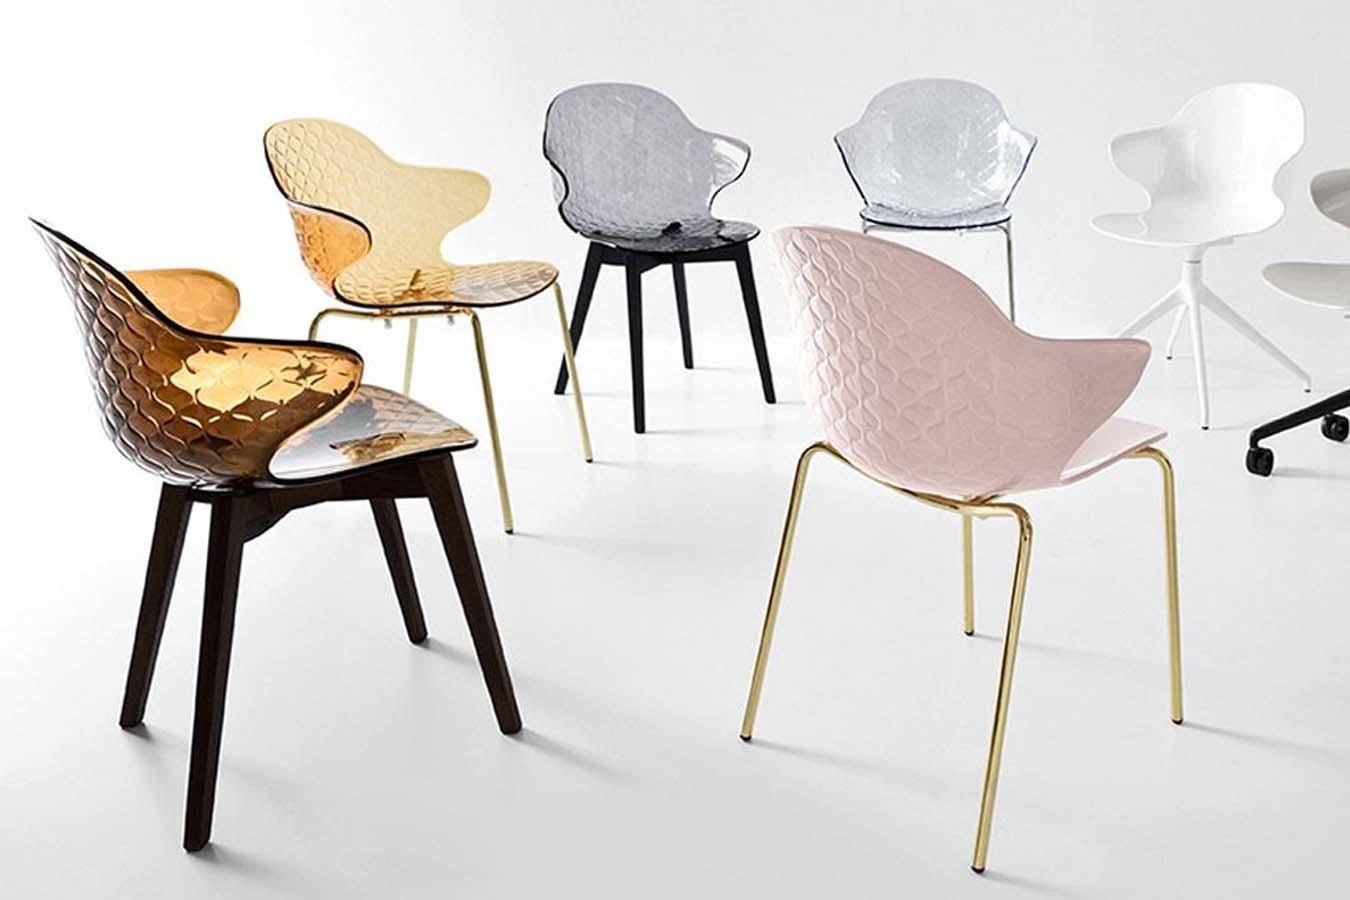 Tavoli e sedie archivi righetti mobili novara for Calligaris saint tropez